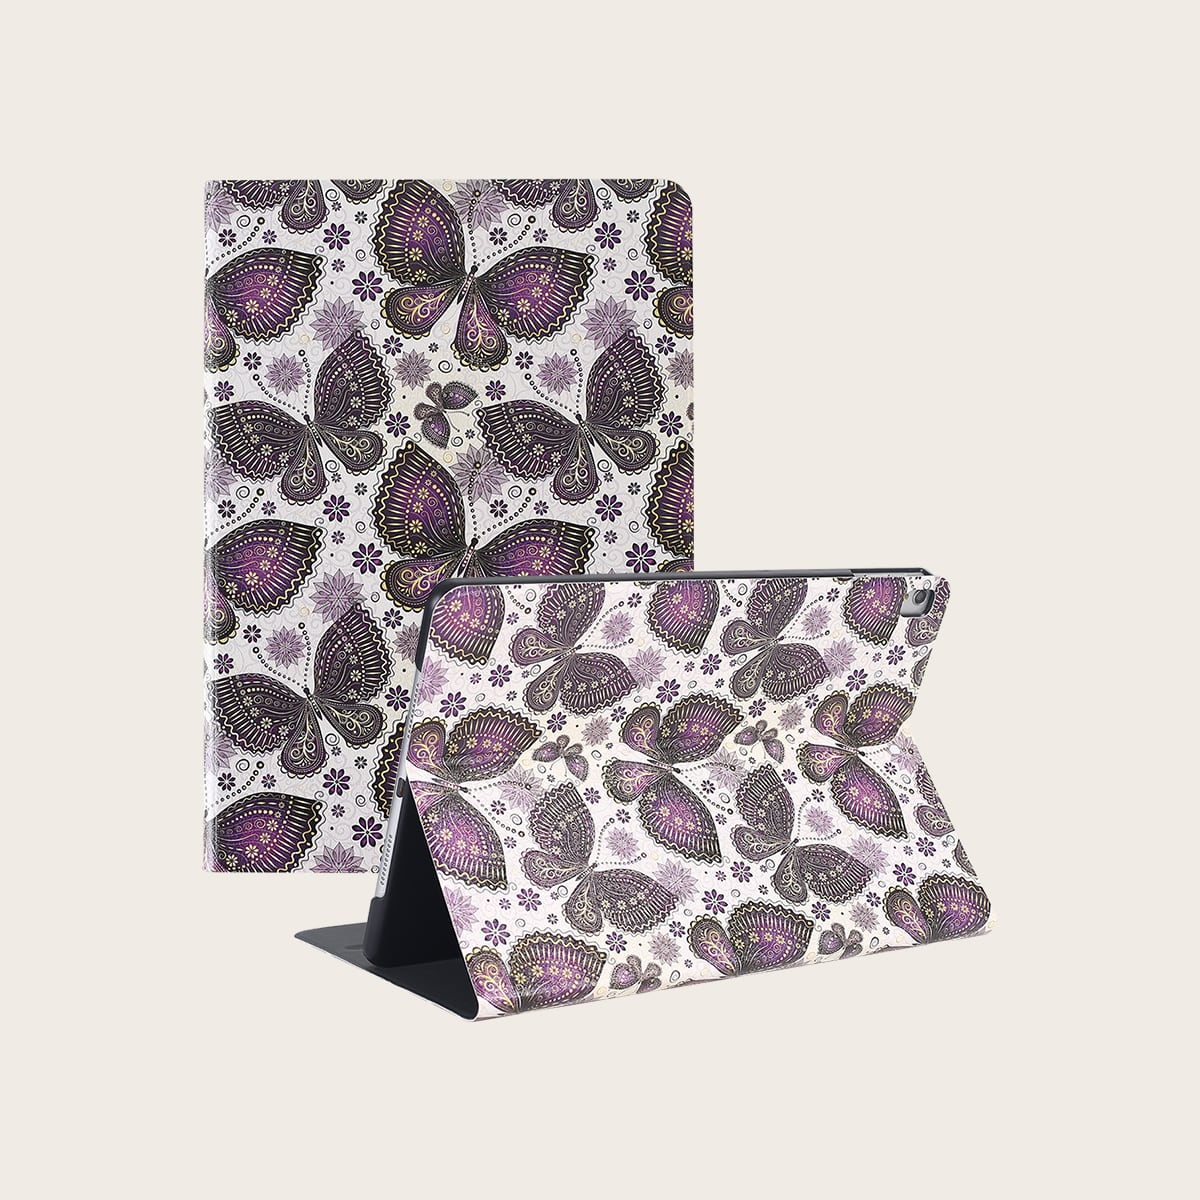 iPad Etui mit Schmetterling Muster